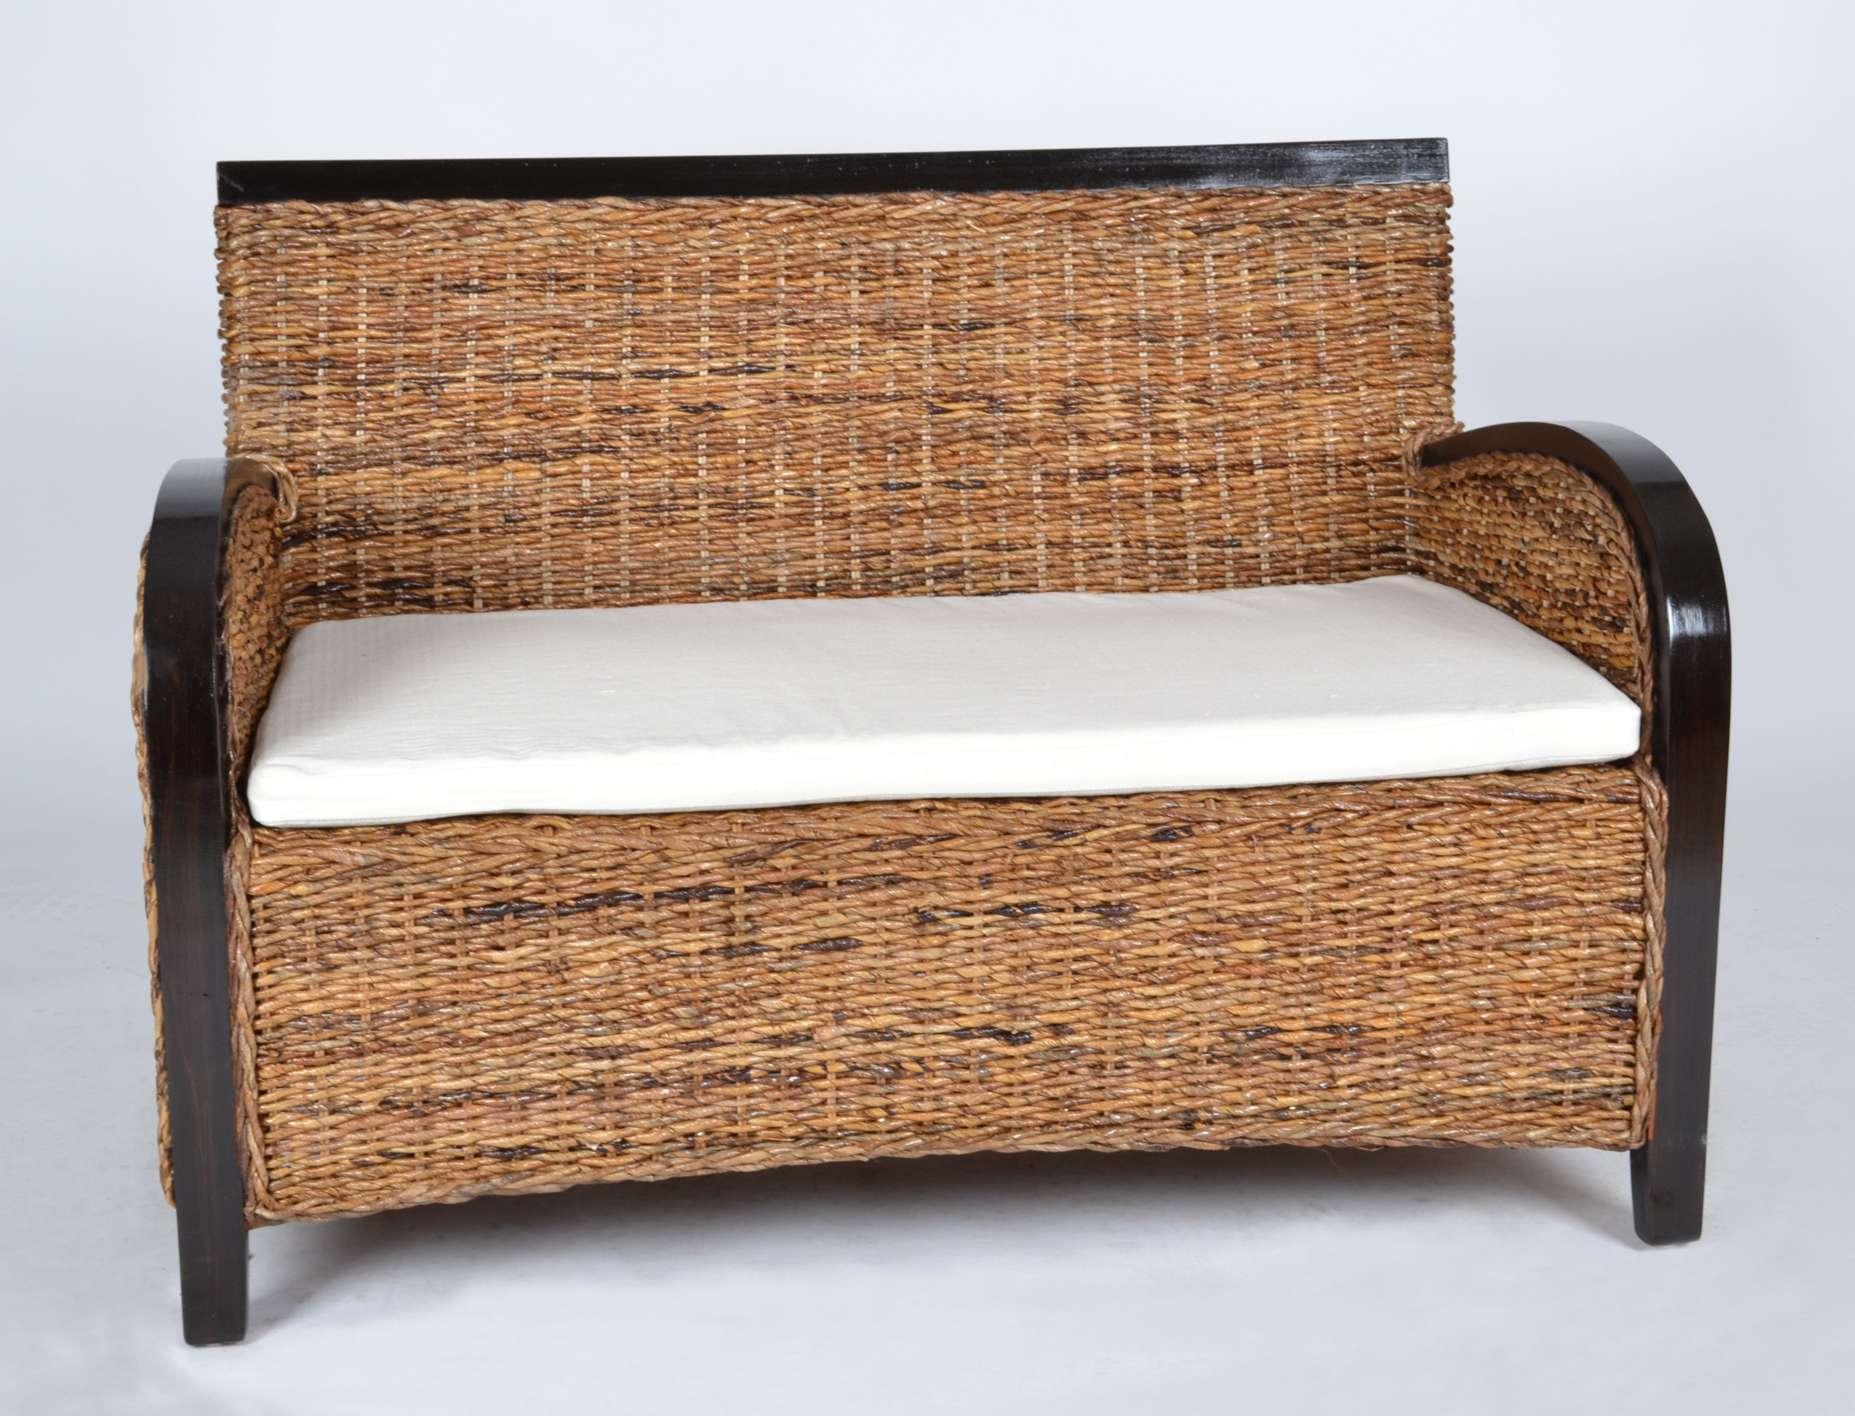 rattansofa 39 kasbulah 39 2 sitzer 80022 bananenblatt geflecht m bel natur ebay. Black Bedroom Furniture Sets. Home Design Ideas